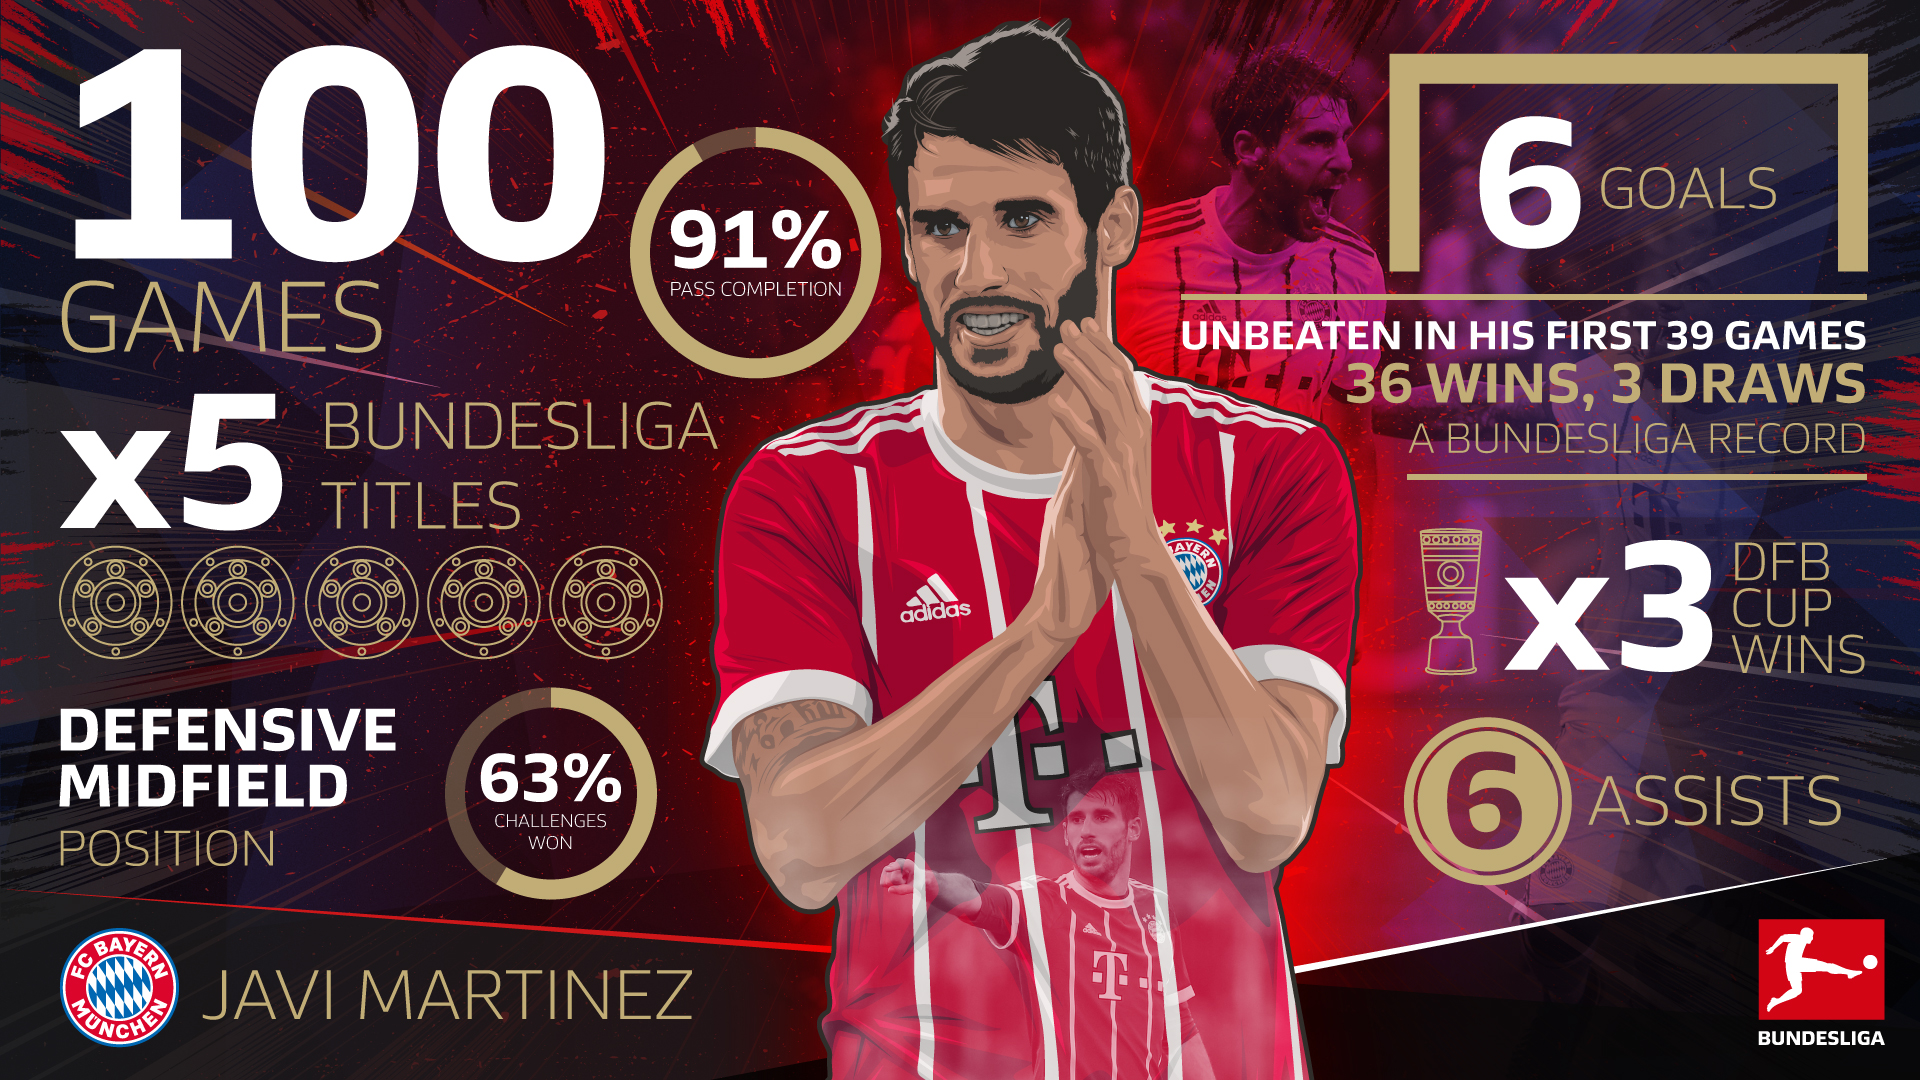 Martinez-100-games-stats-1920x1080